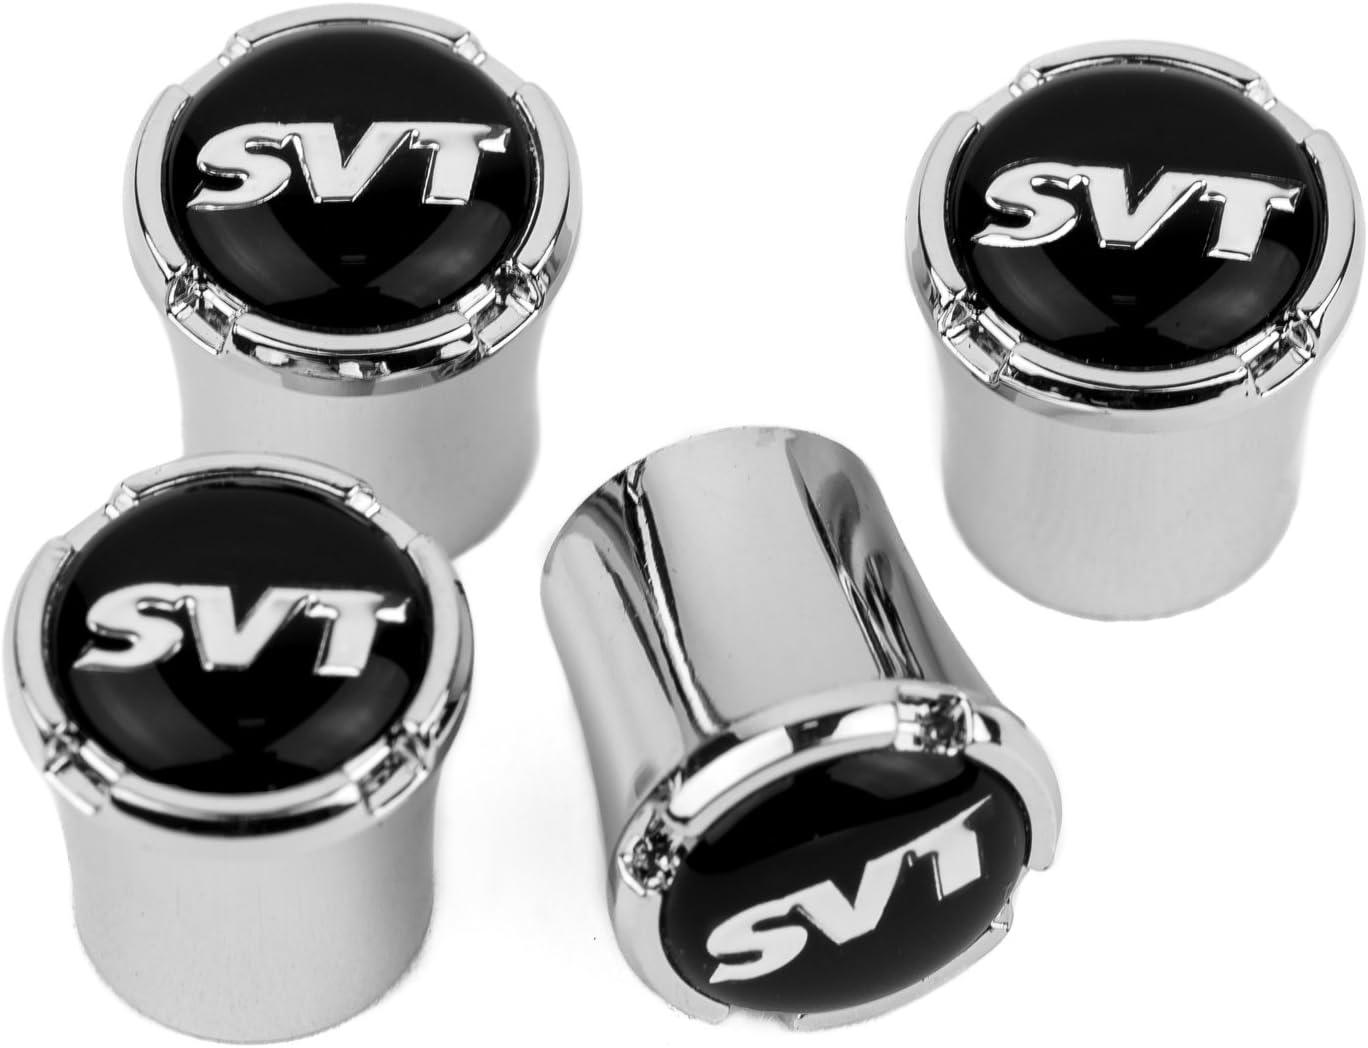 Cadillac Rims Logo Valves Stems Caps Chromed Wheels Air Car Tires Set of 4 USA